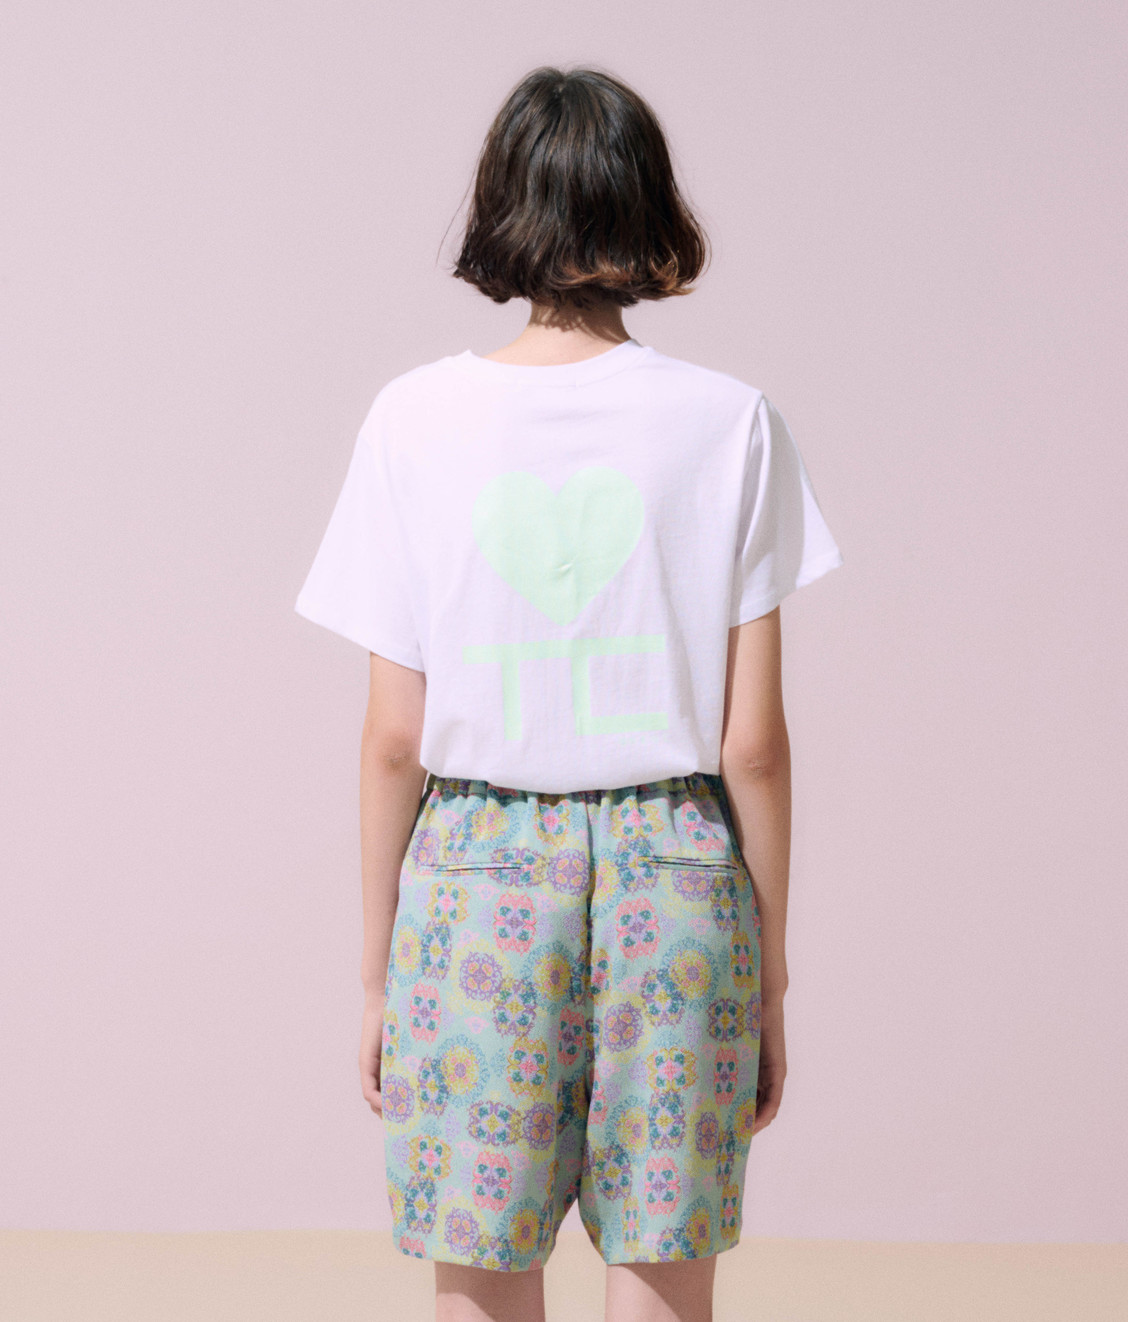 NEUL Neul Lubdub T-shirt White